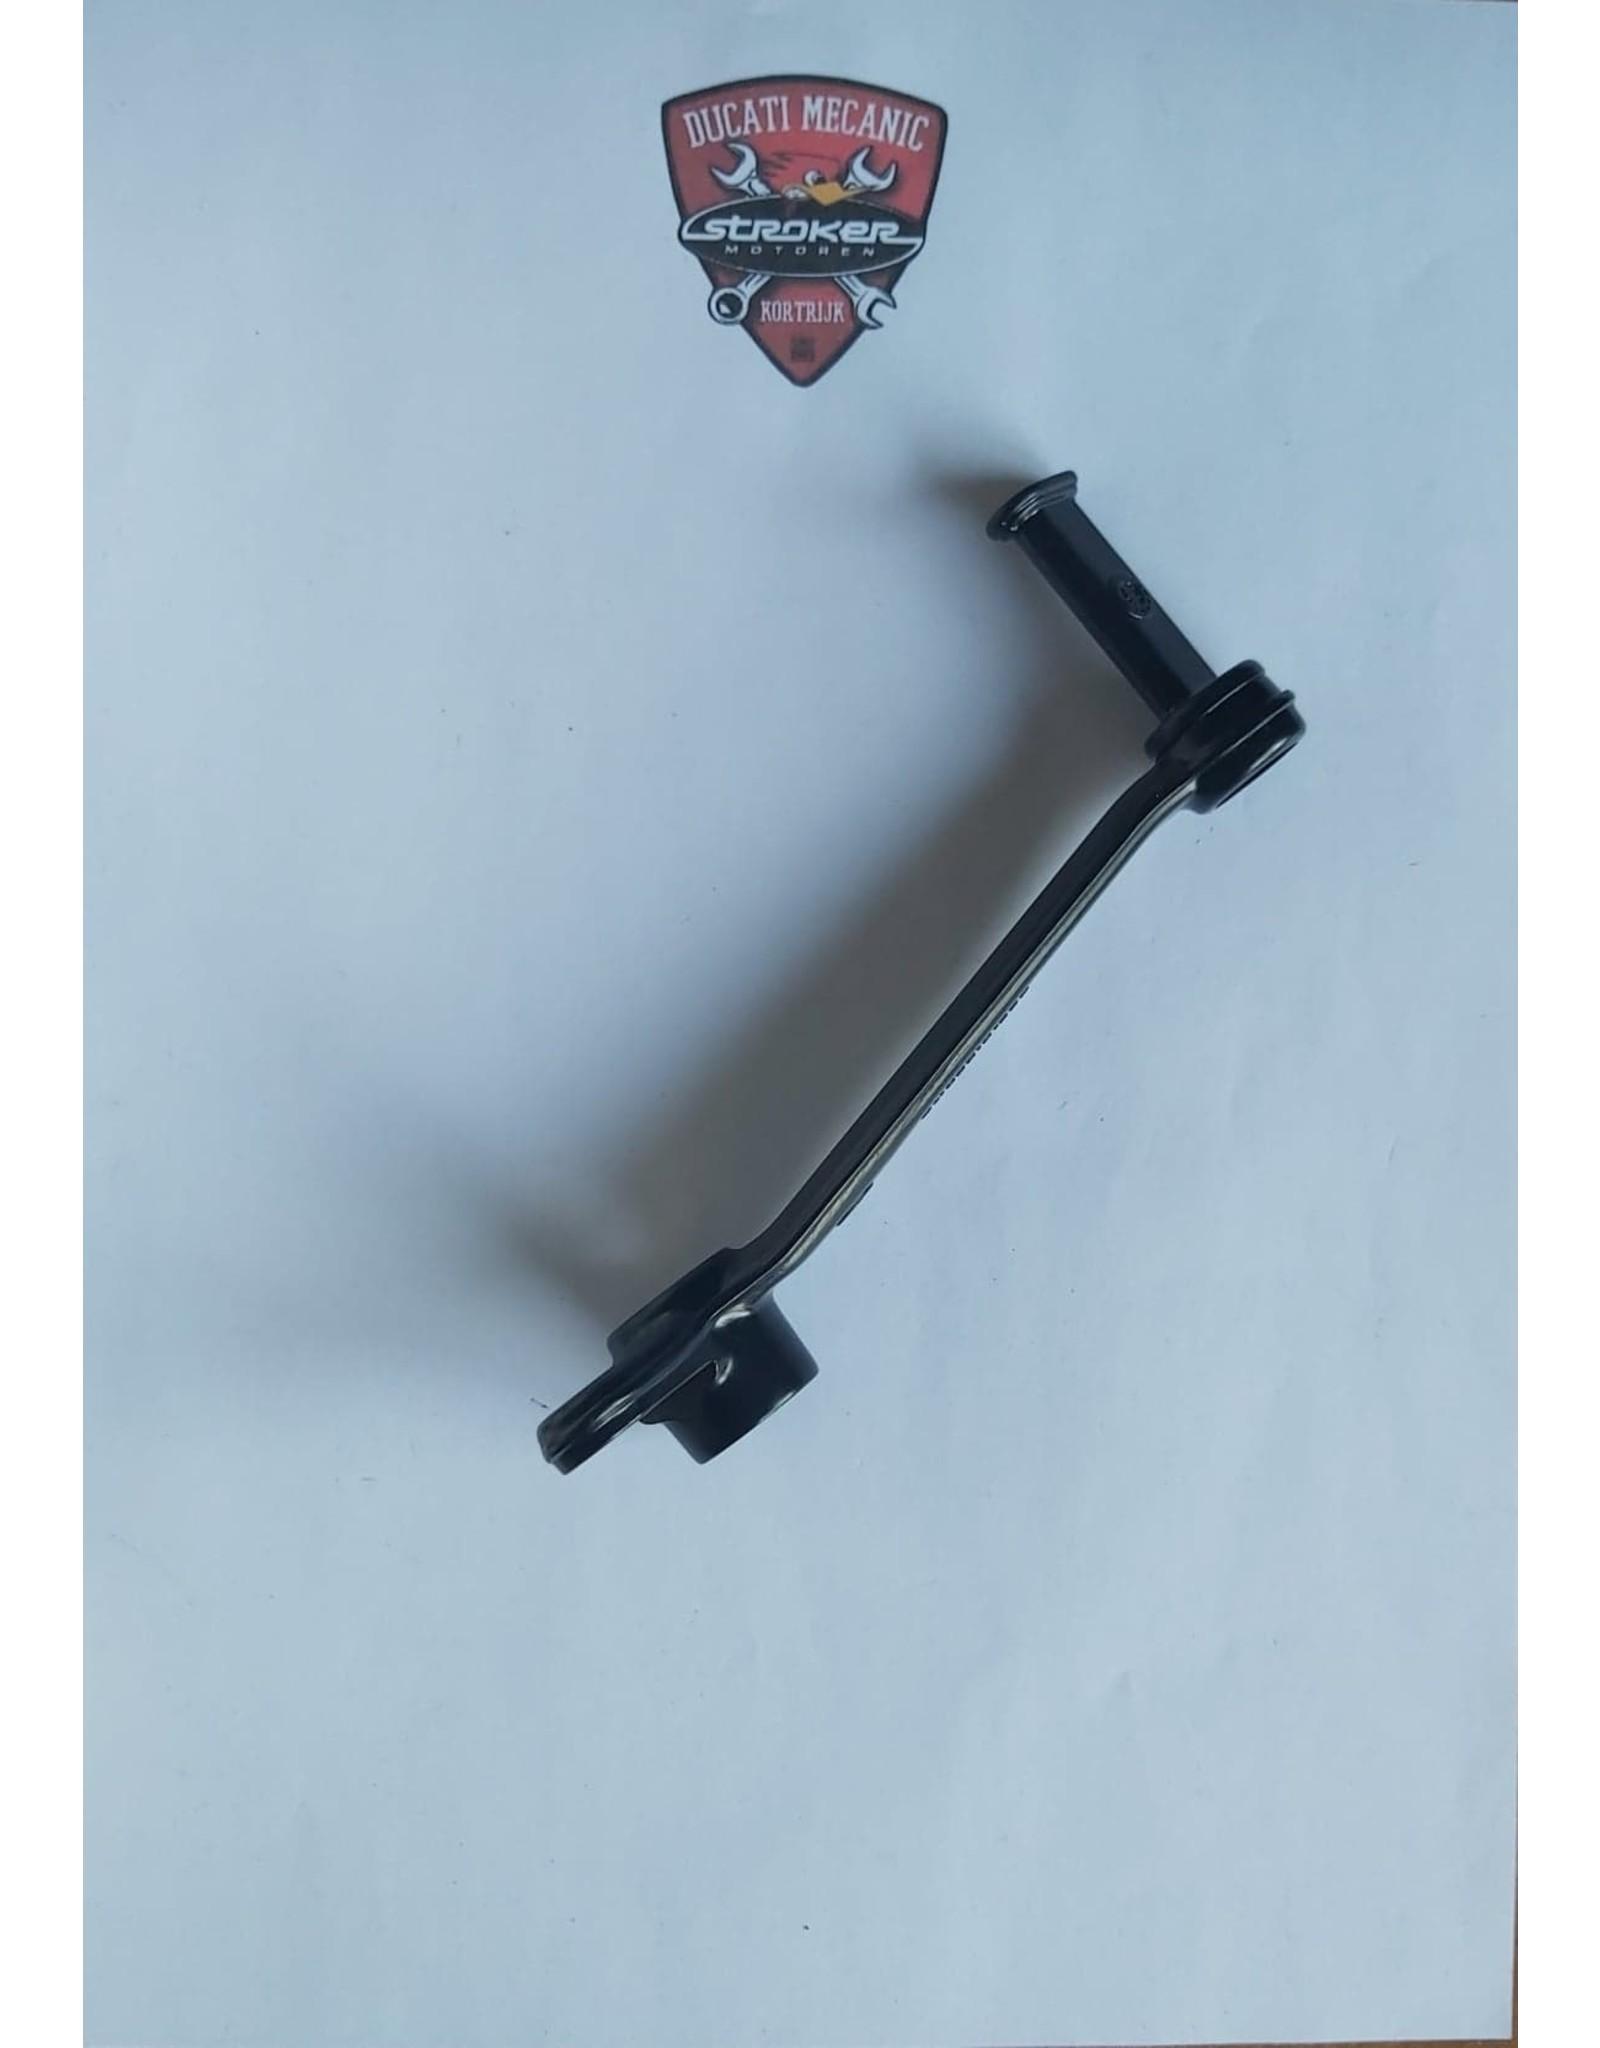 Ducati Ducati Gearchange lever, black HYM 796/1100 45620581AB